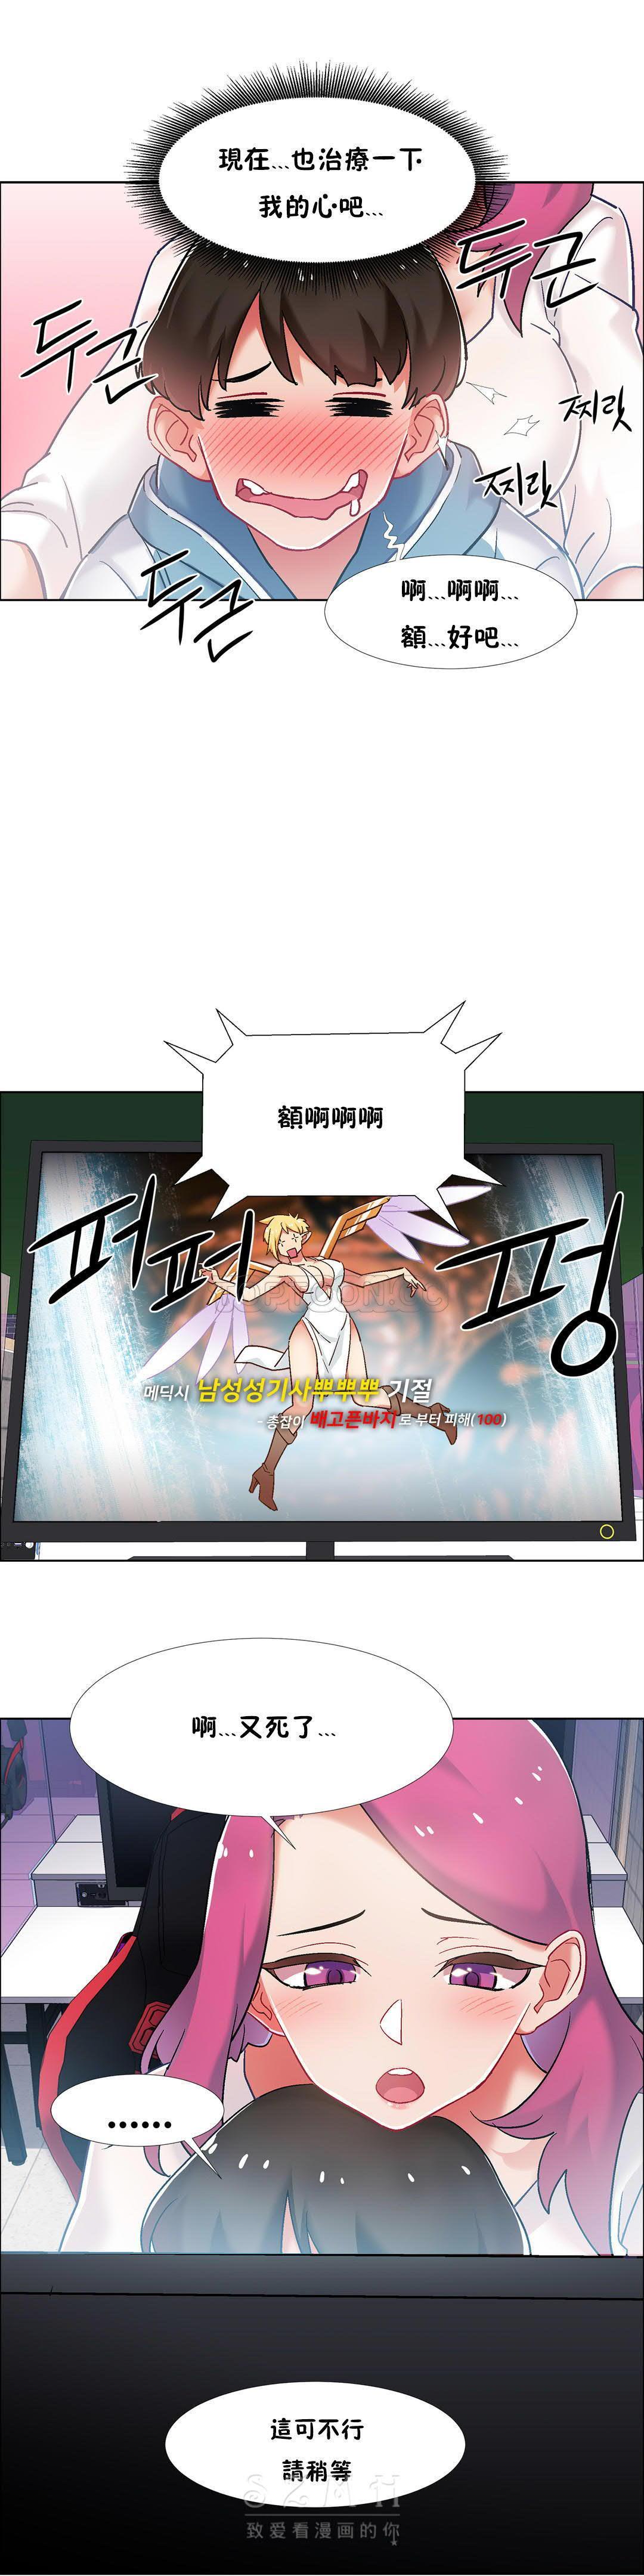 [Studio Wannabe] Rental Girls | 出租女郎 Ch. 33-58 [Chinese]  第二季 完结 22